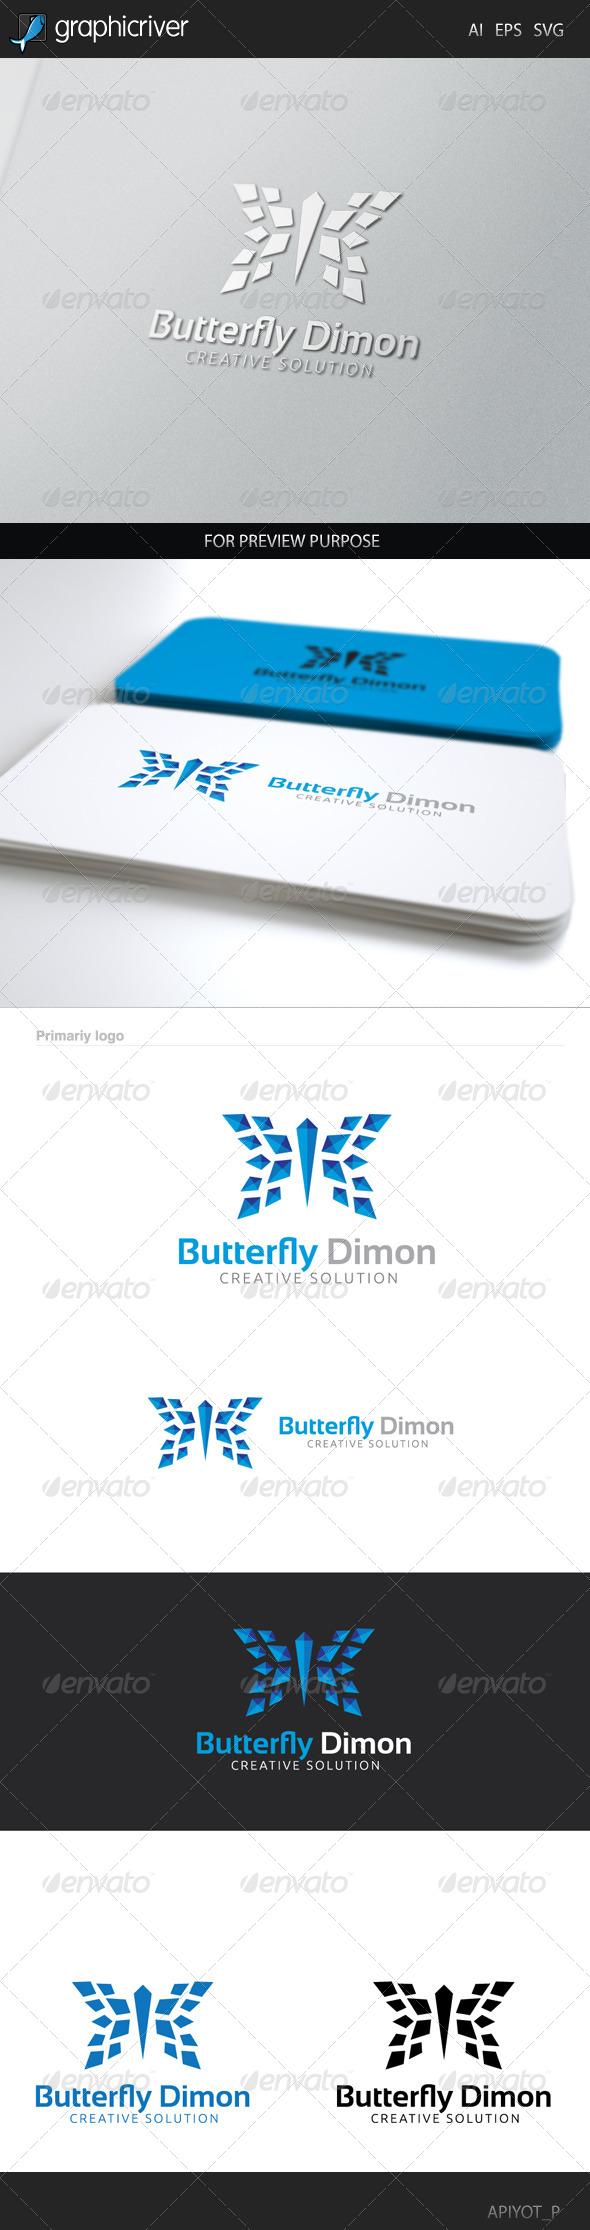 Butterfly Dimon Logo